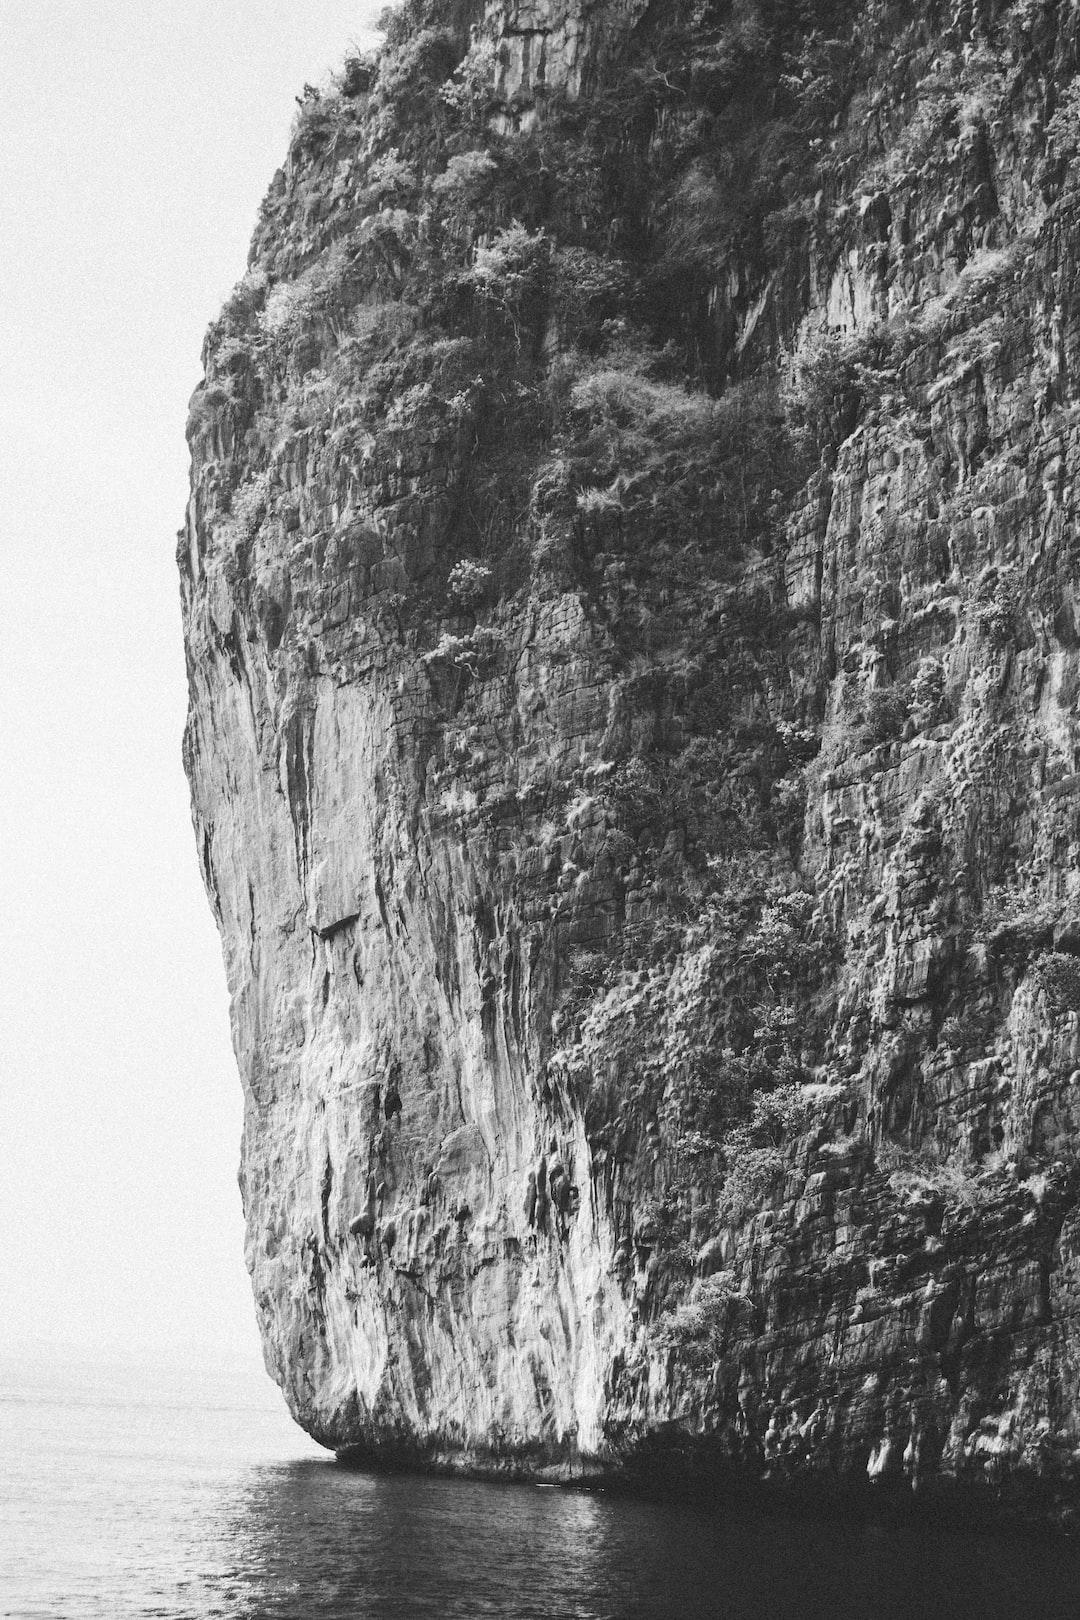 Cliffs of Phi Phi Island